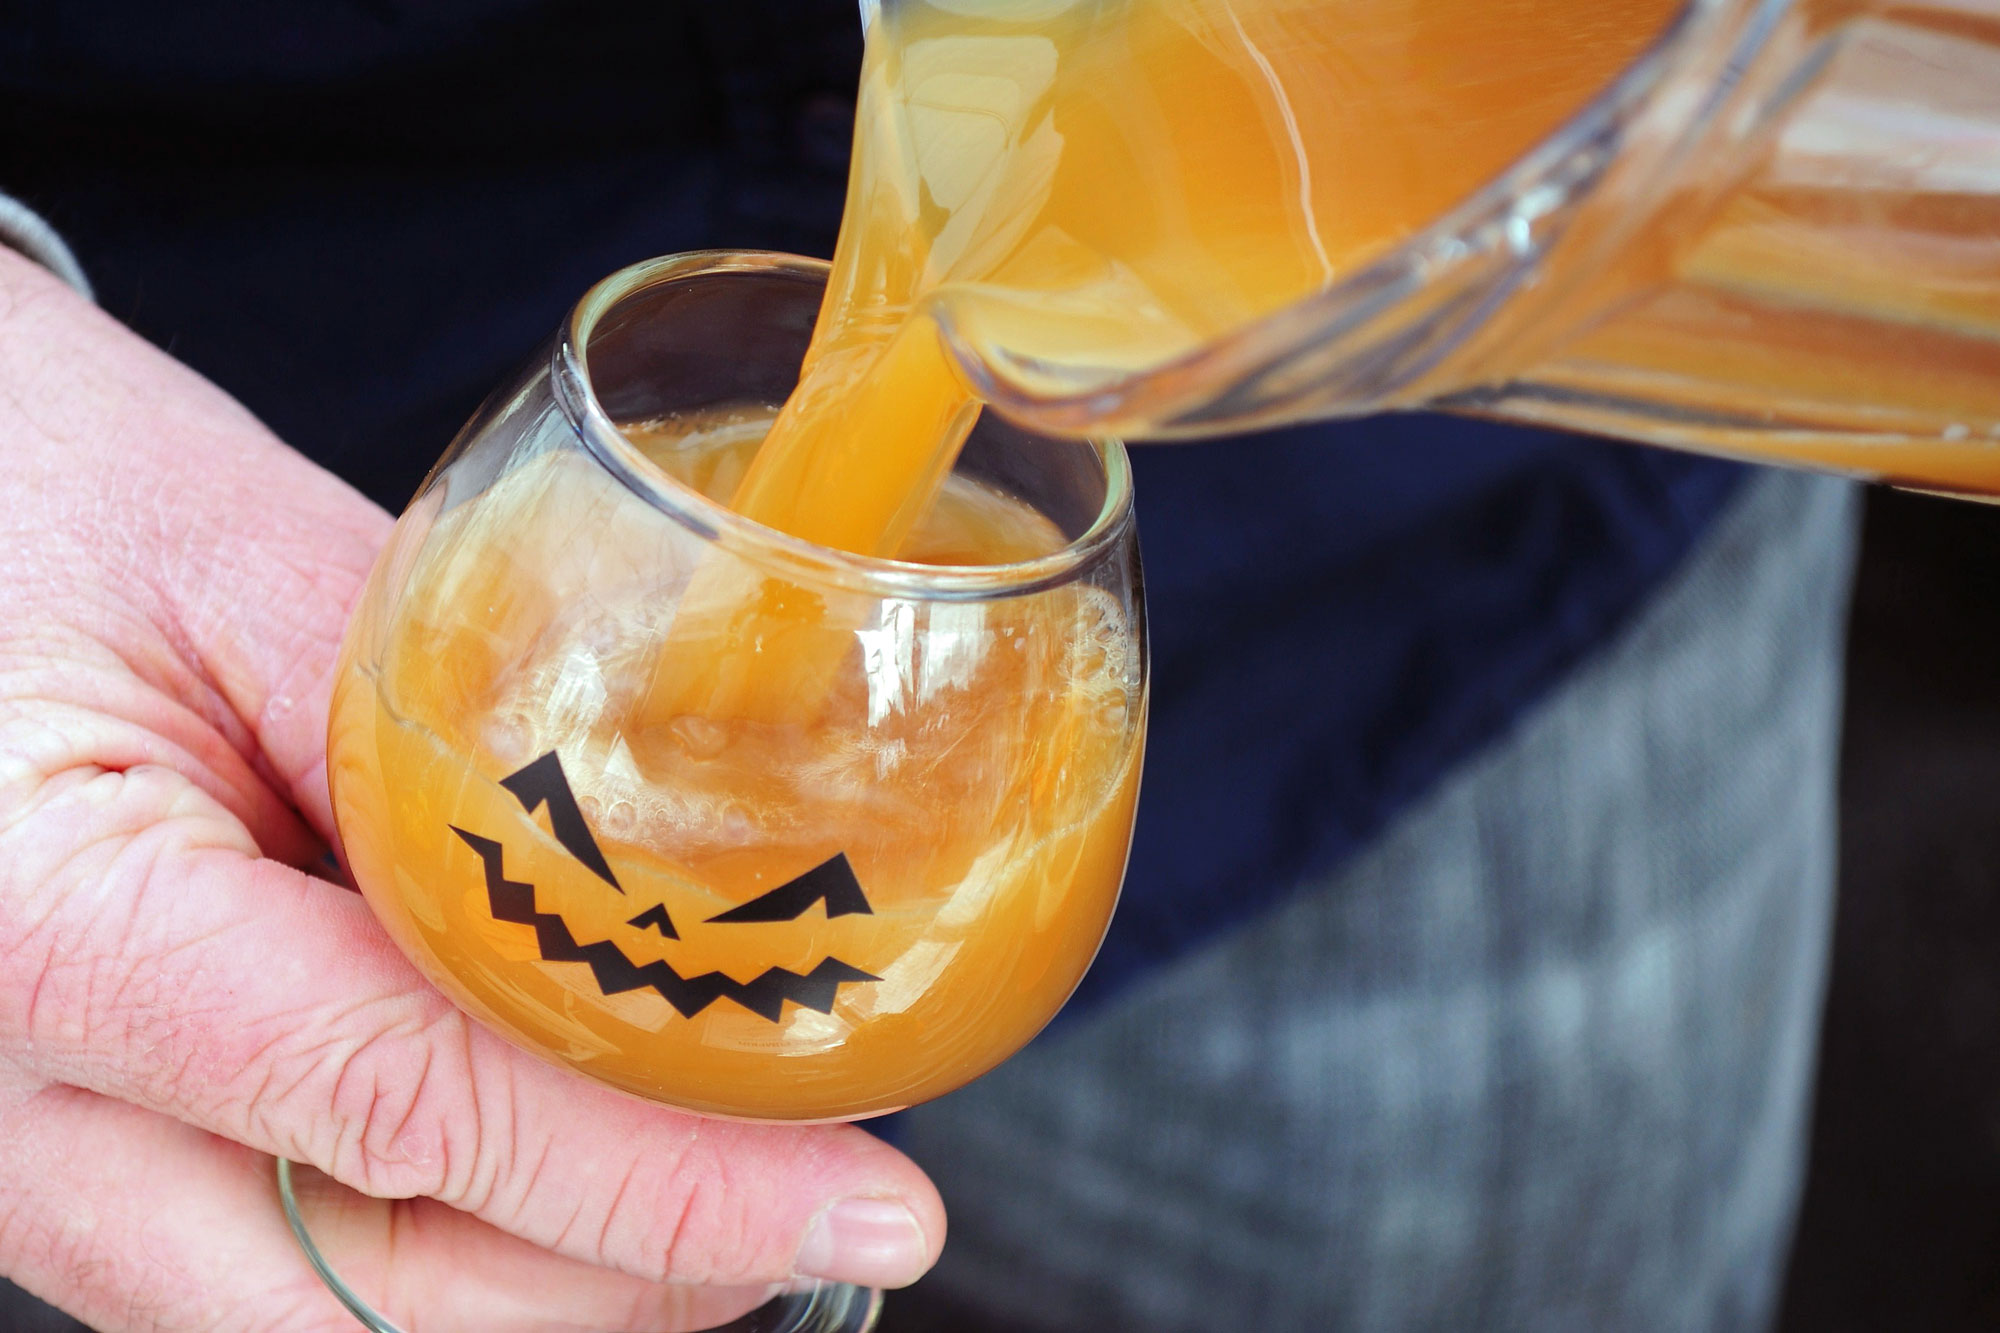 pumpkin beer in a jack-o-lantern glass